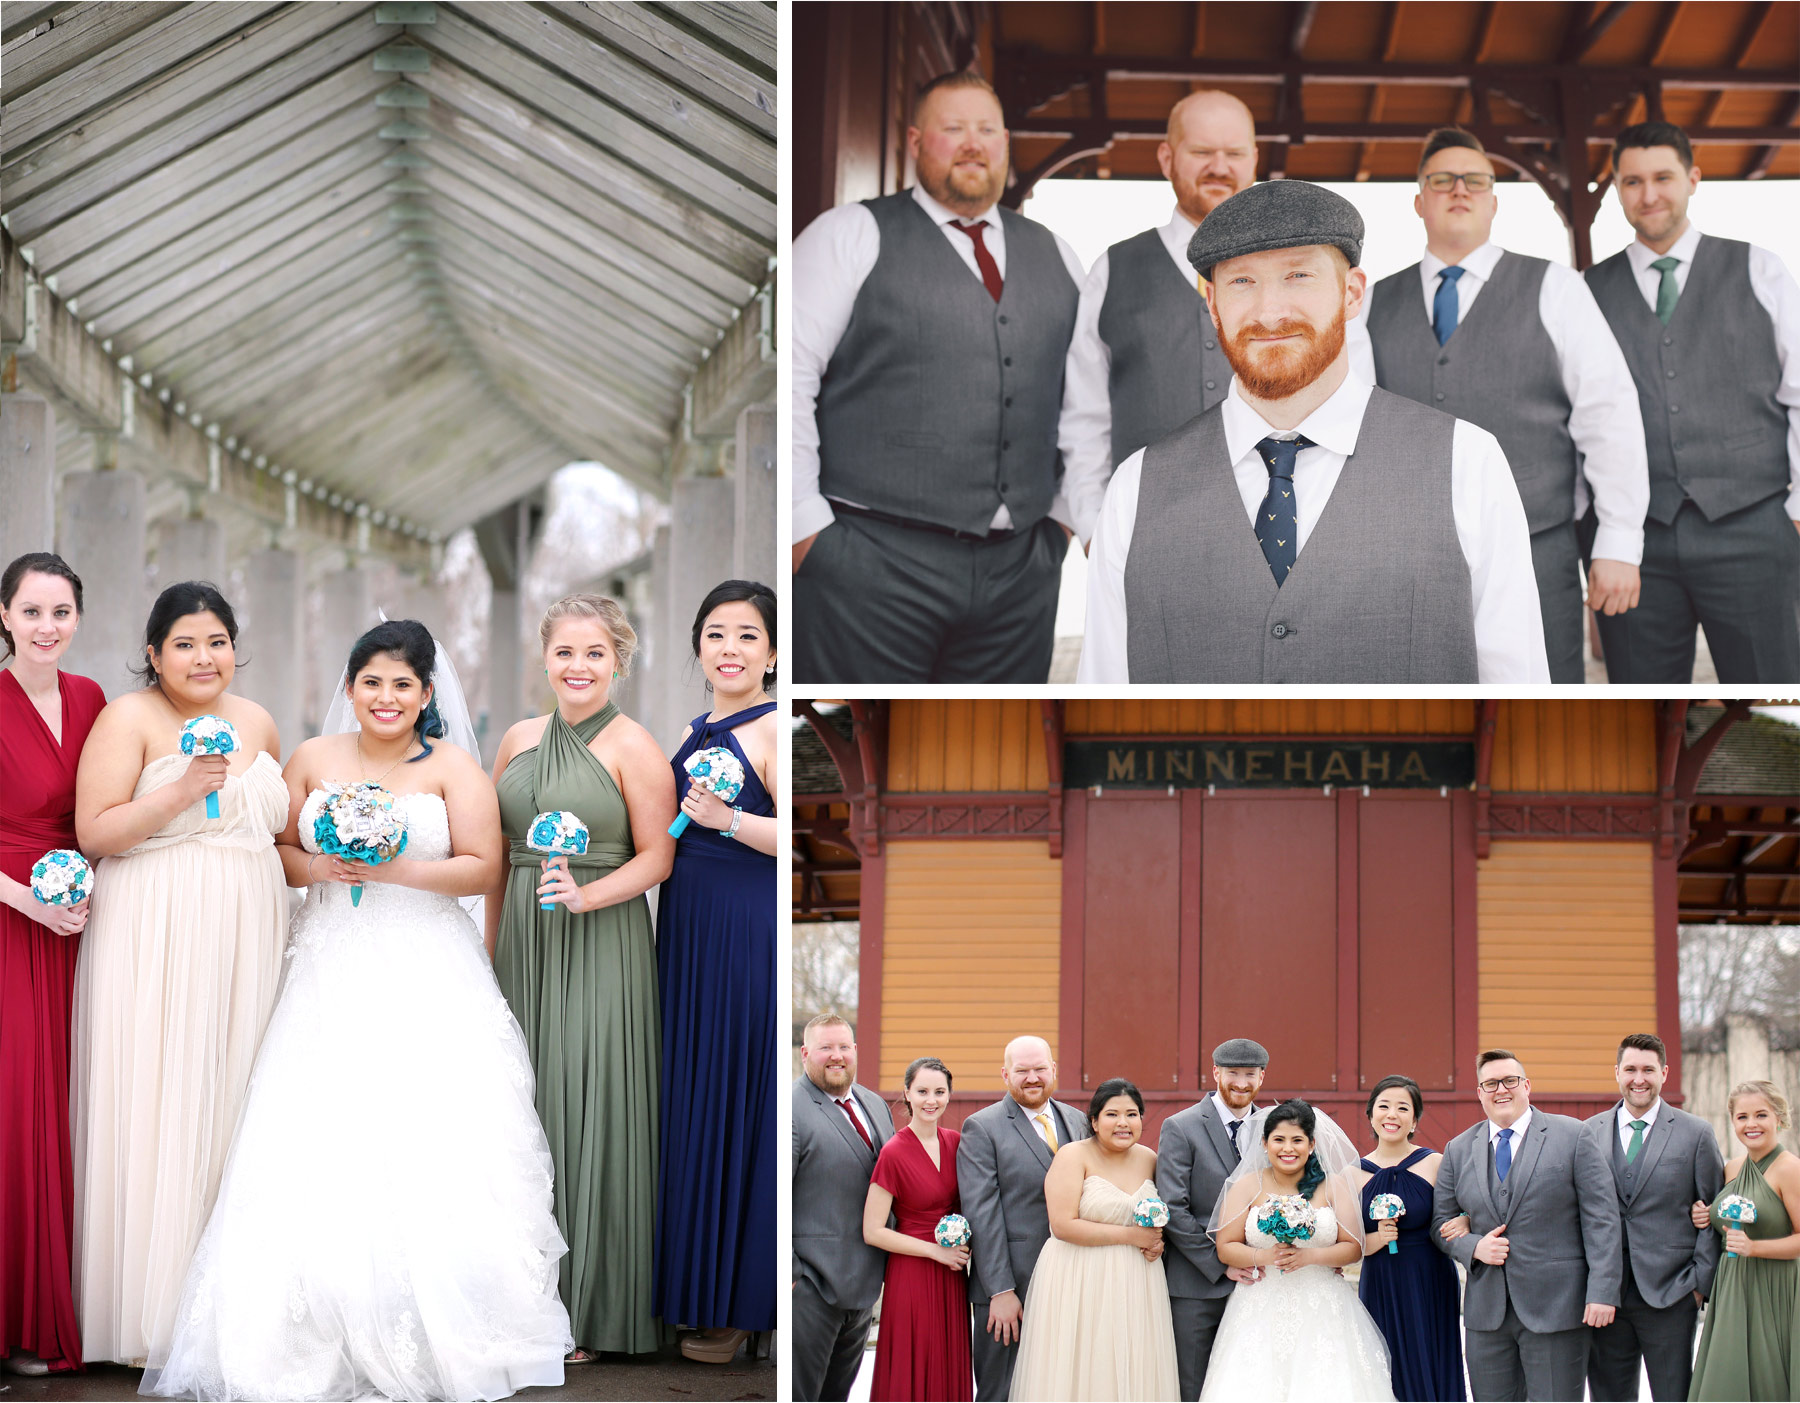 09-Saint-Paul-Minnesota-Wedding-Photography-by-Vick-Photography-Groomsmen-Vests-Bridesmaids-Mismatched-Dresses-Groom-Hat-Elena-and-Doug.jpg